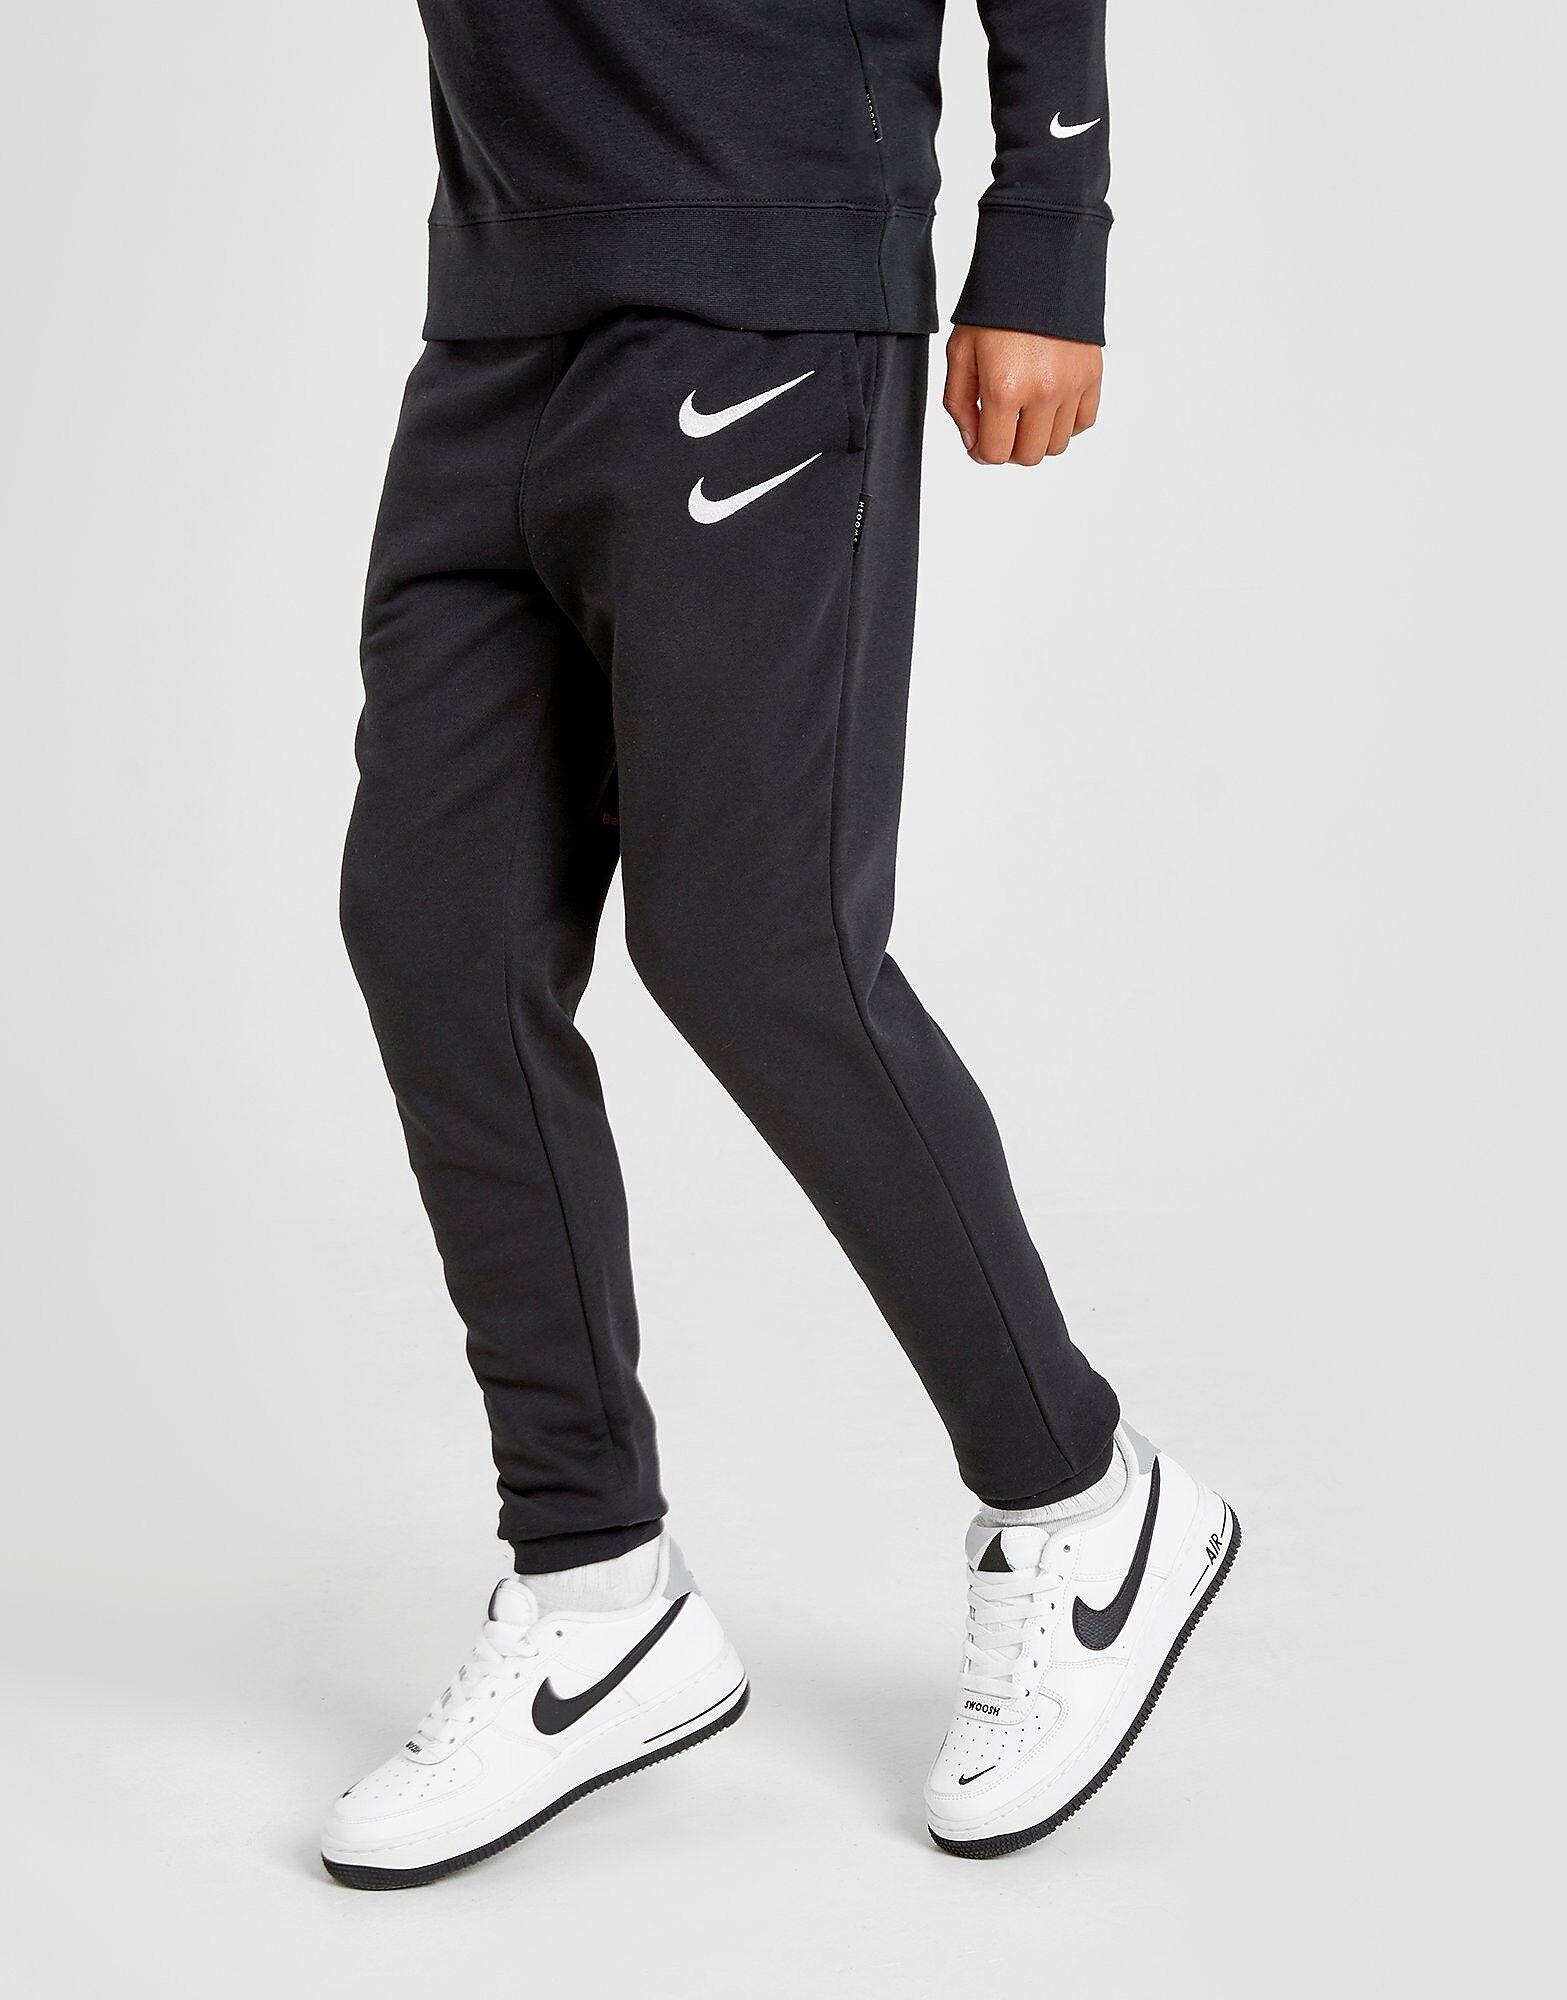 Image of Nike Swoosh Verryttelyhousut Juniorit - Kids, Musta